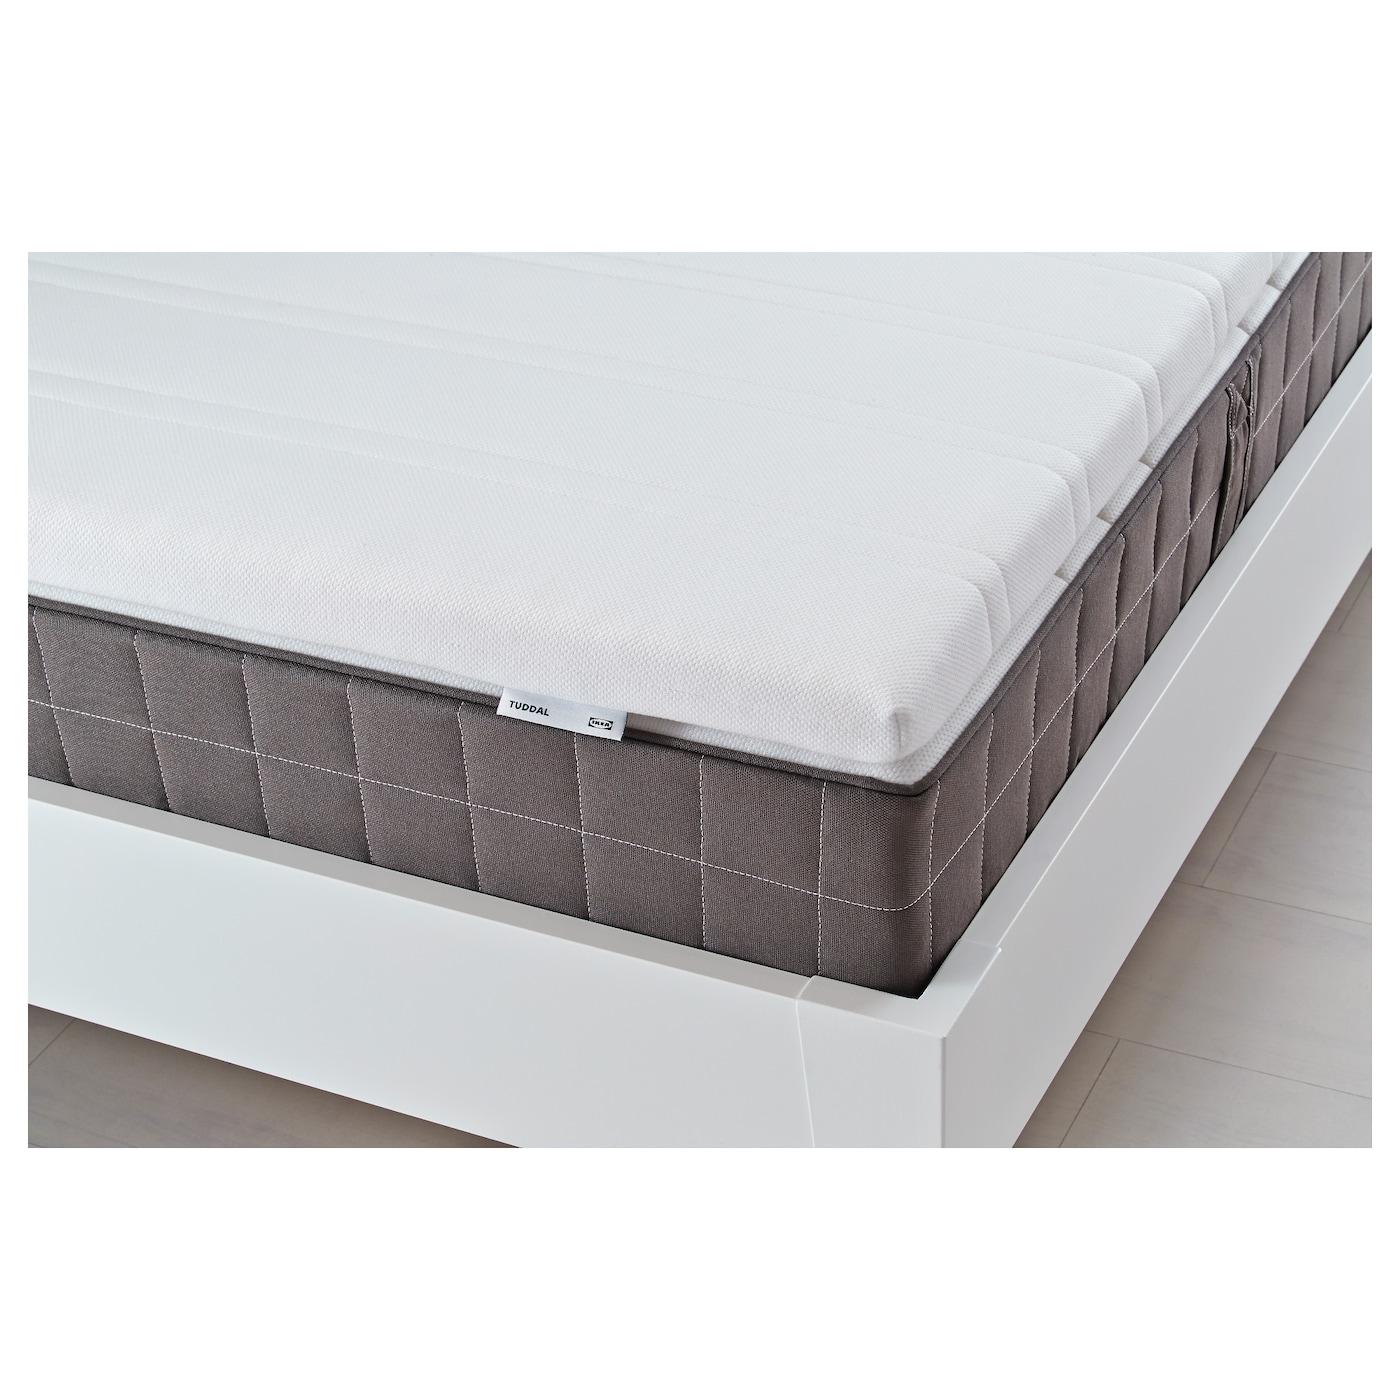 TUDDAL Mattress topper White Standard Double IKEA